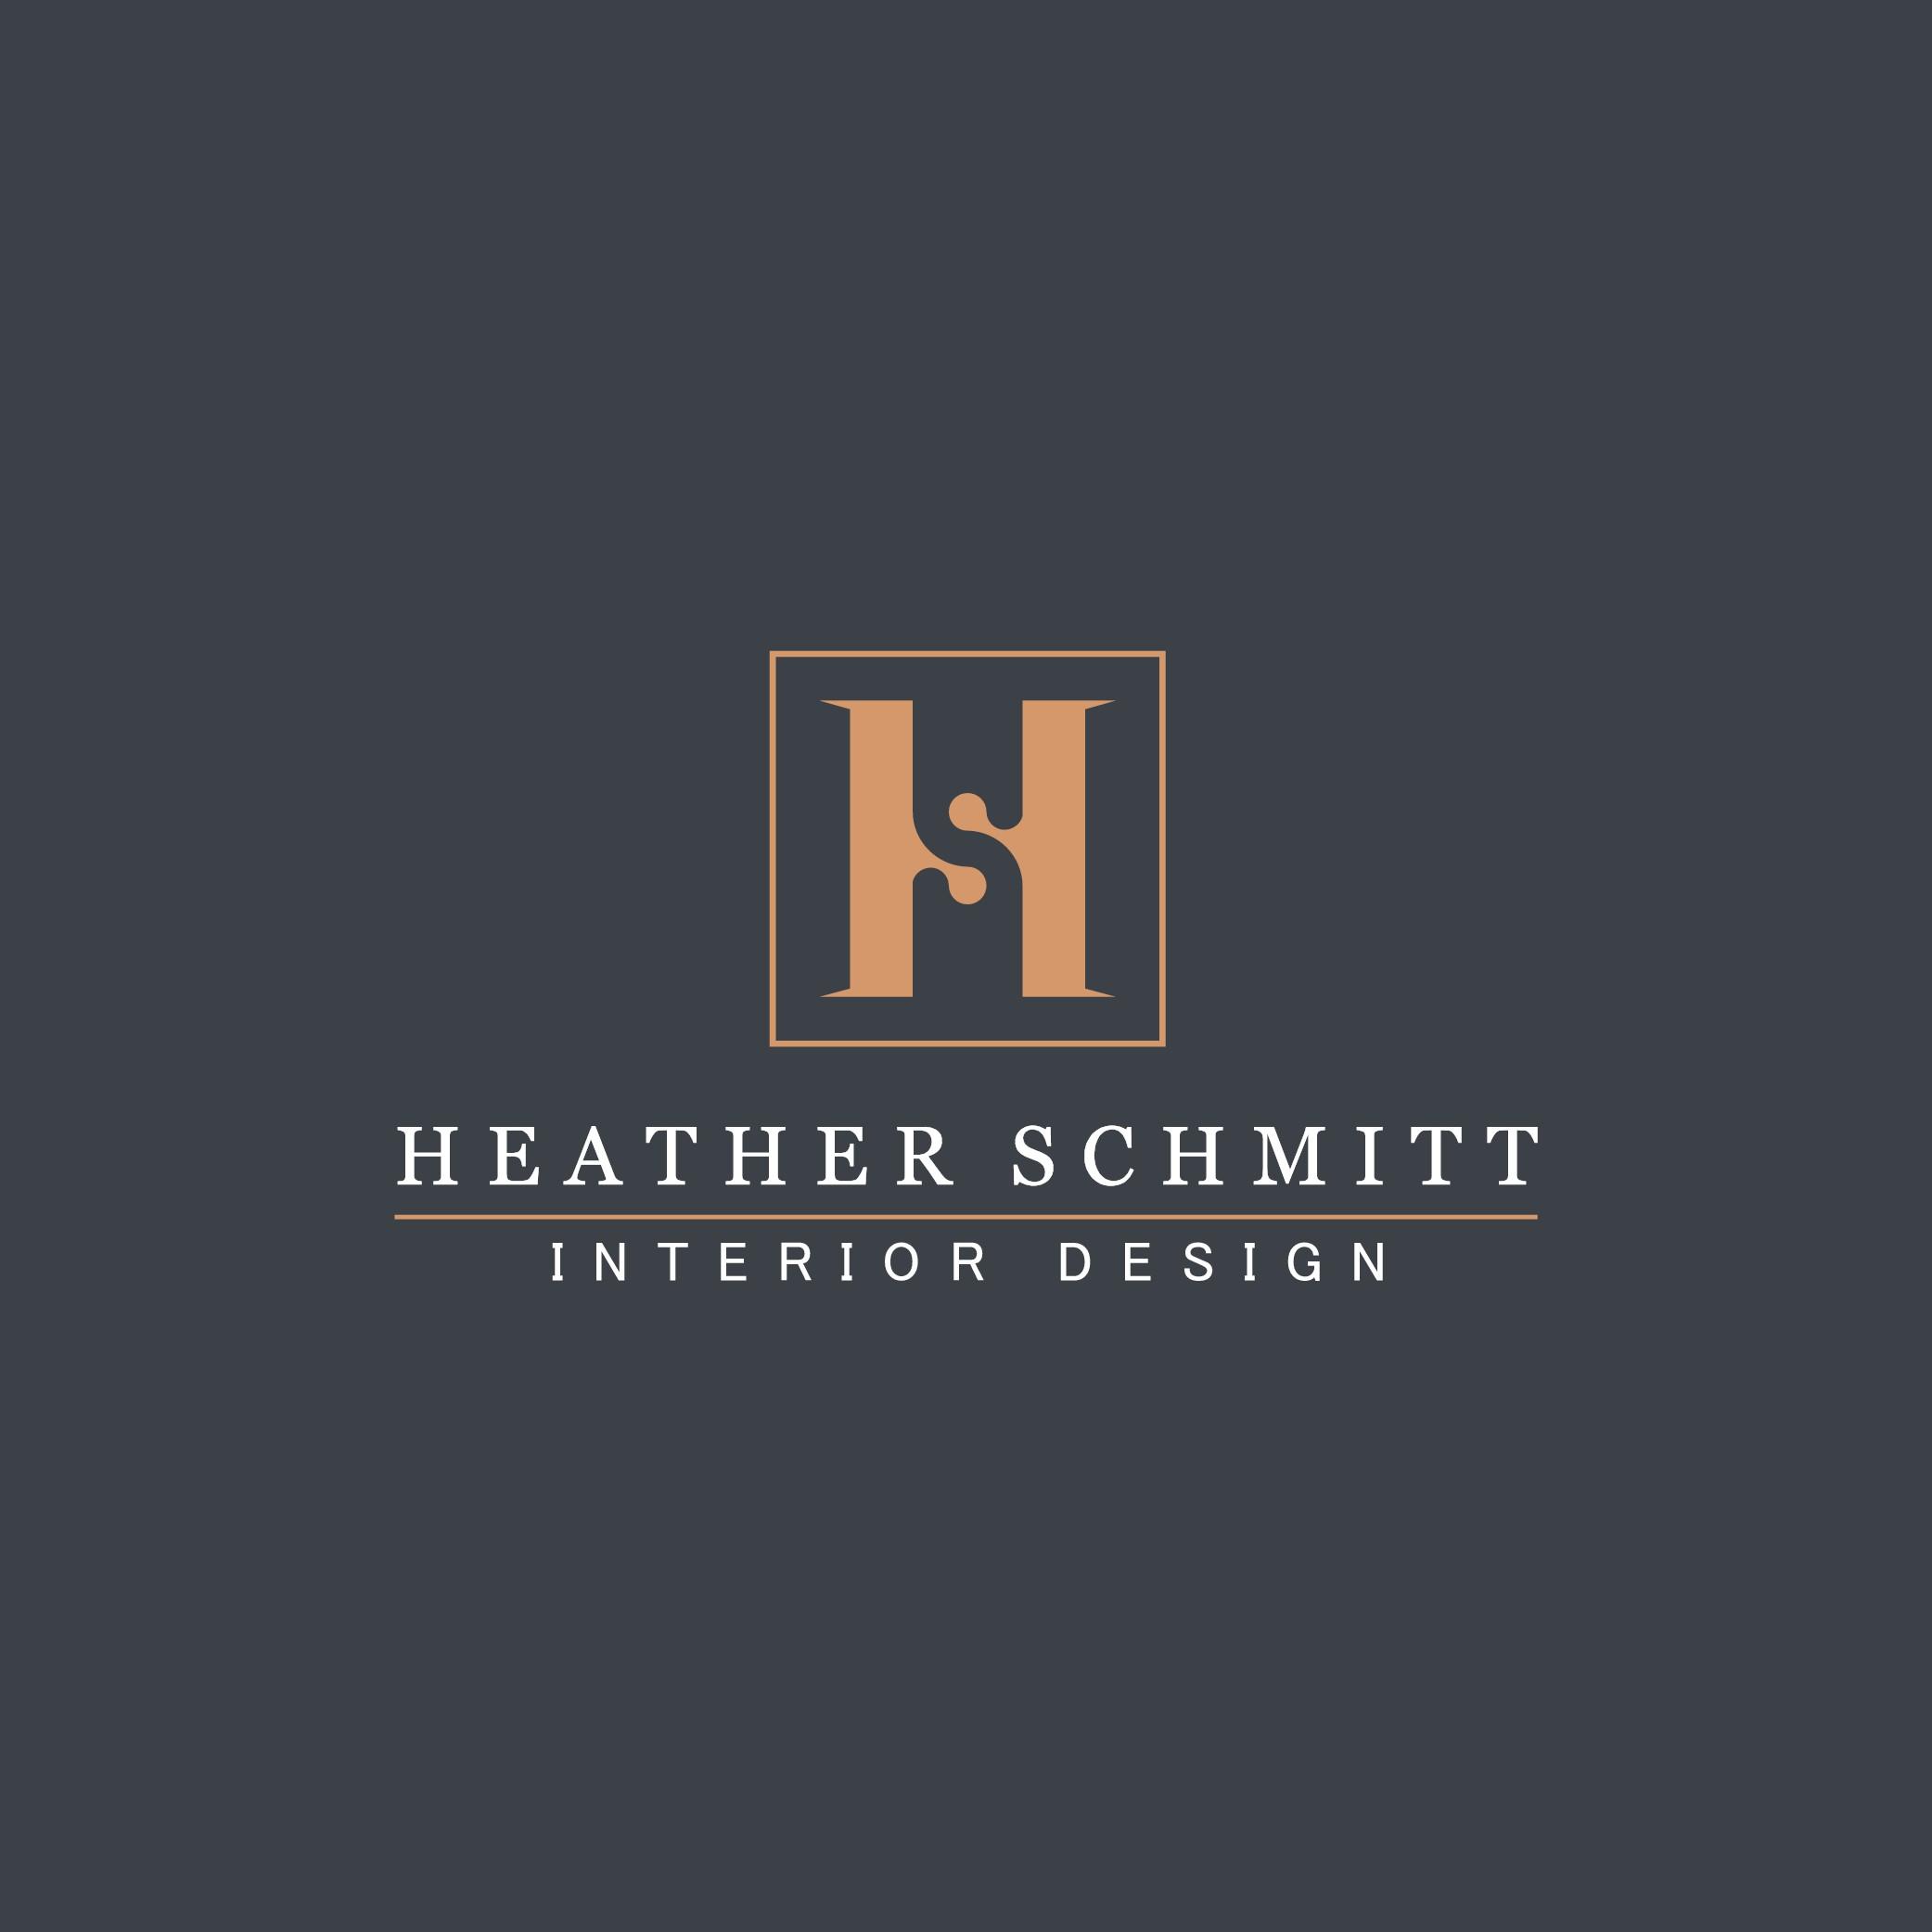 Creative logo needed for interior designer